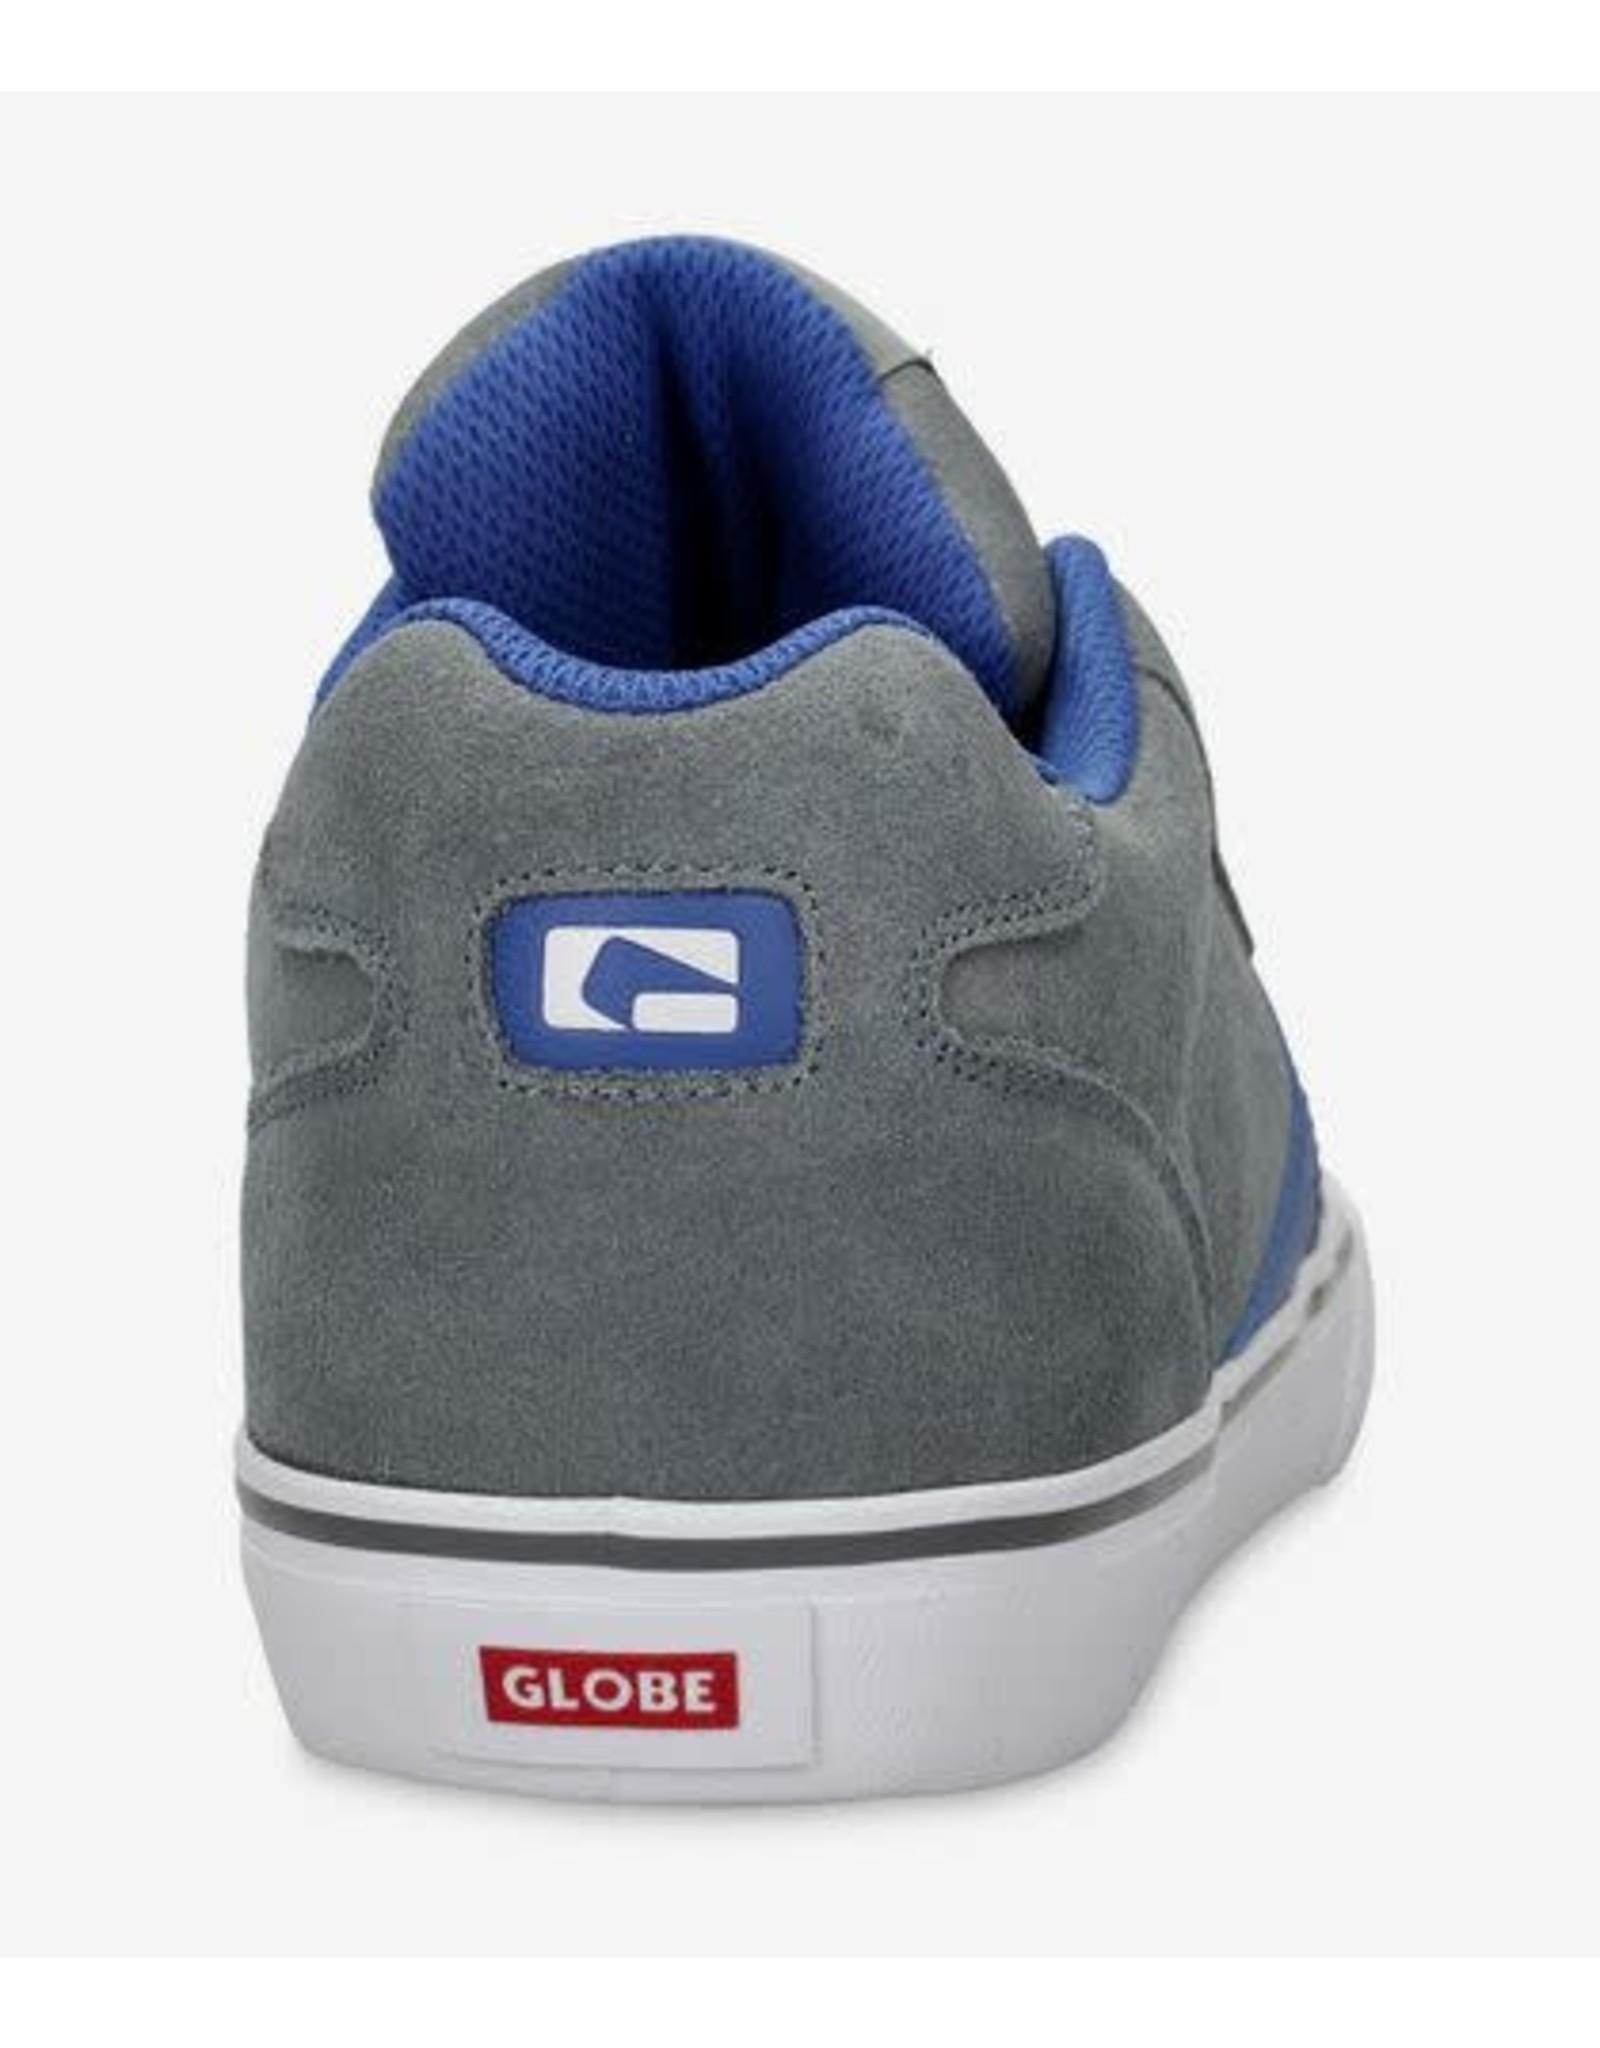 globe Globe - Soulier homme  encore -2 iron blue